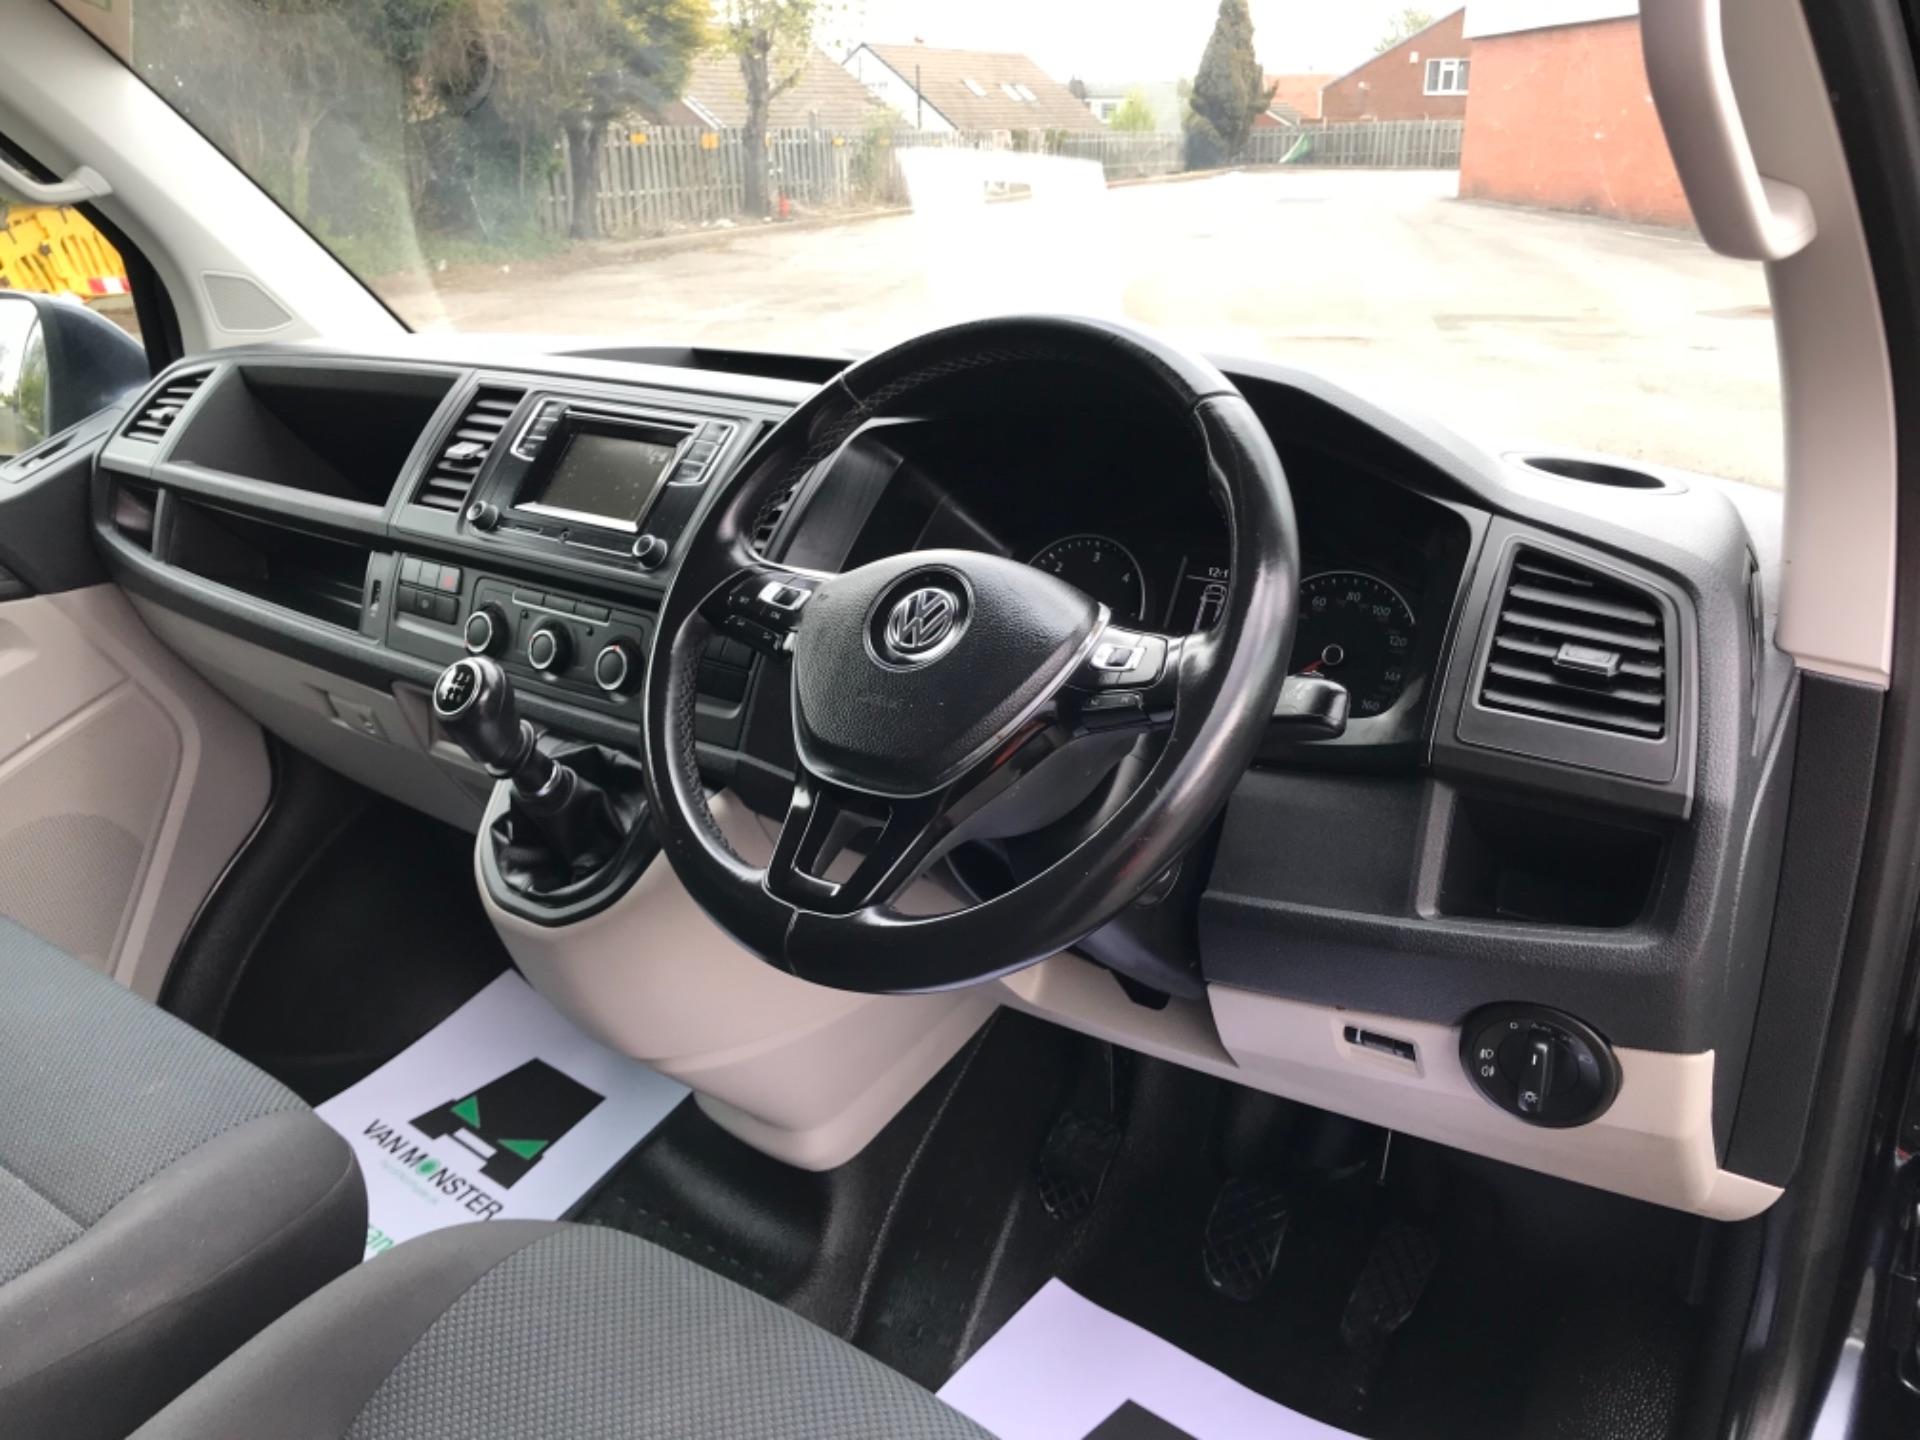 2019 Volkswagen Transporter 2.0 Tdi Bmt 150 Highline Van EURO 6 (GX69ZSN) Image 11